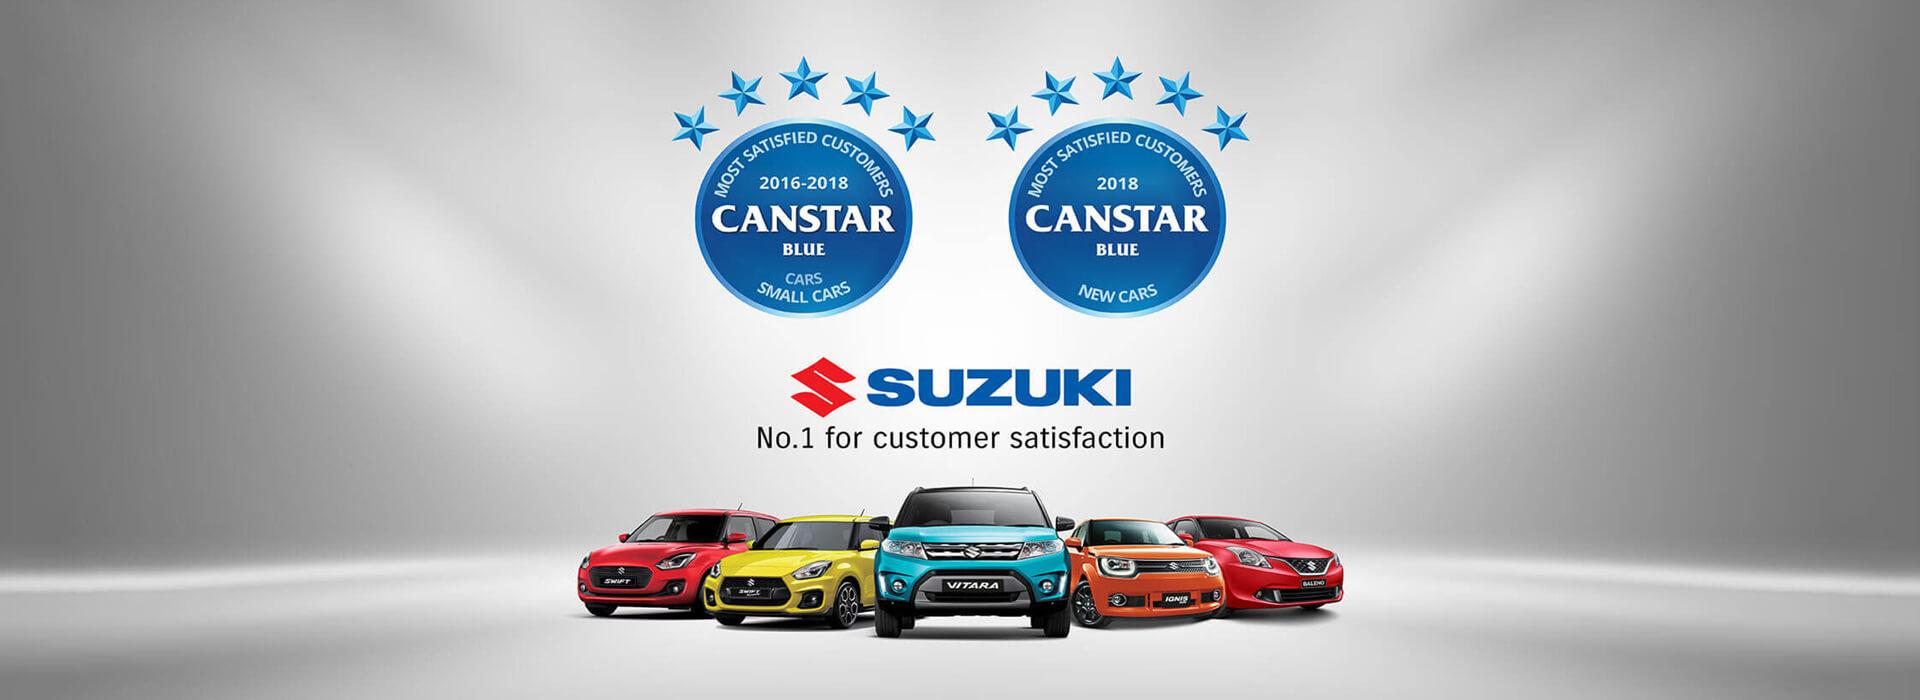 Canstar Awards